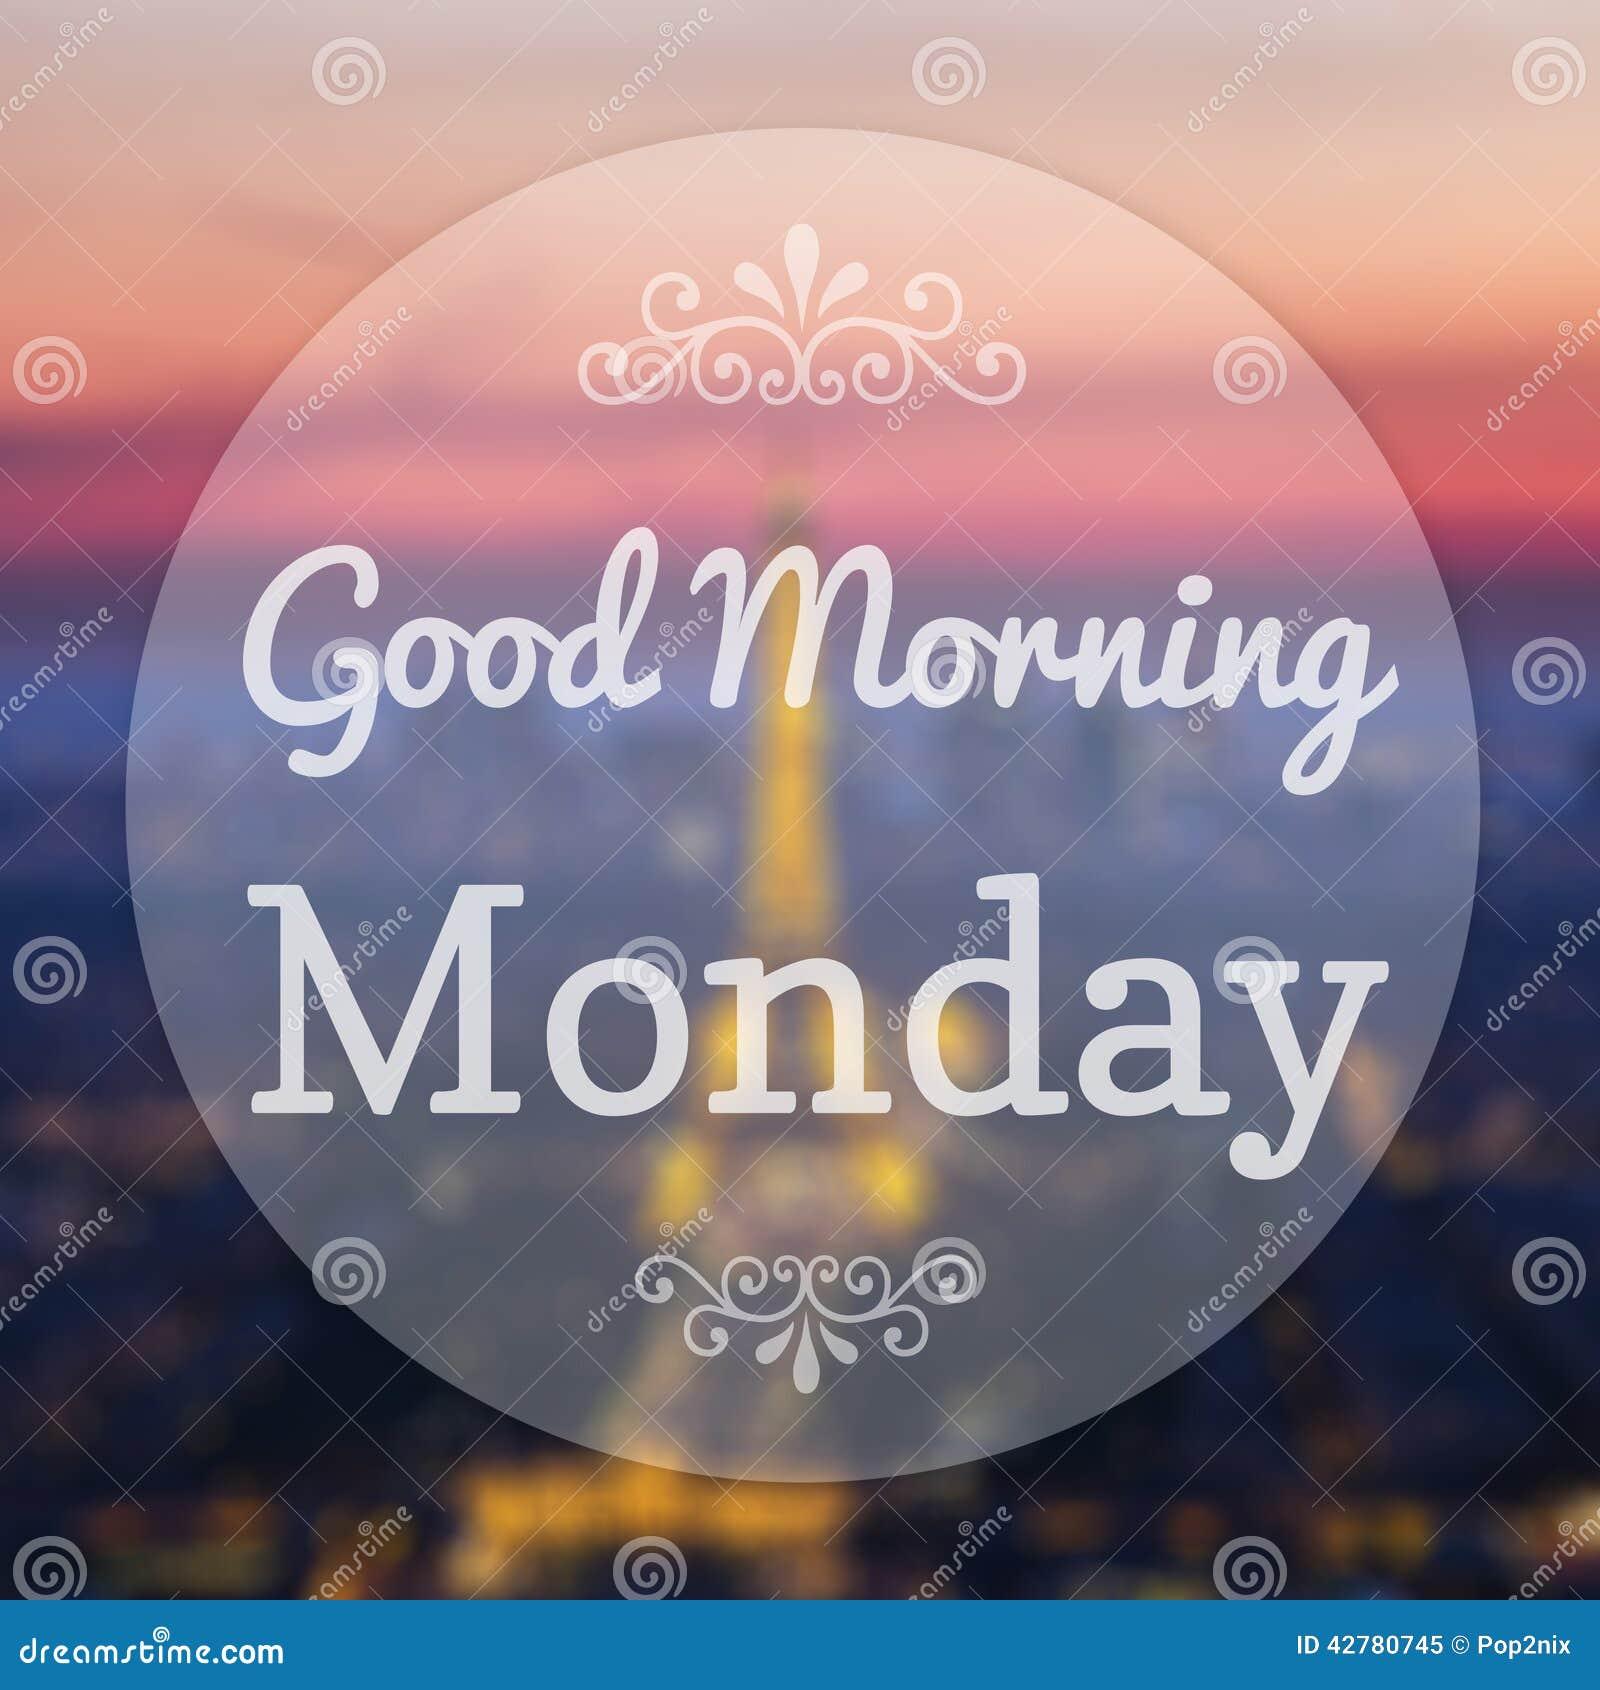 Good Morning Monday Images Good morning monday